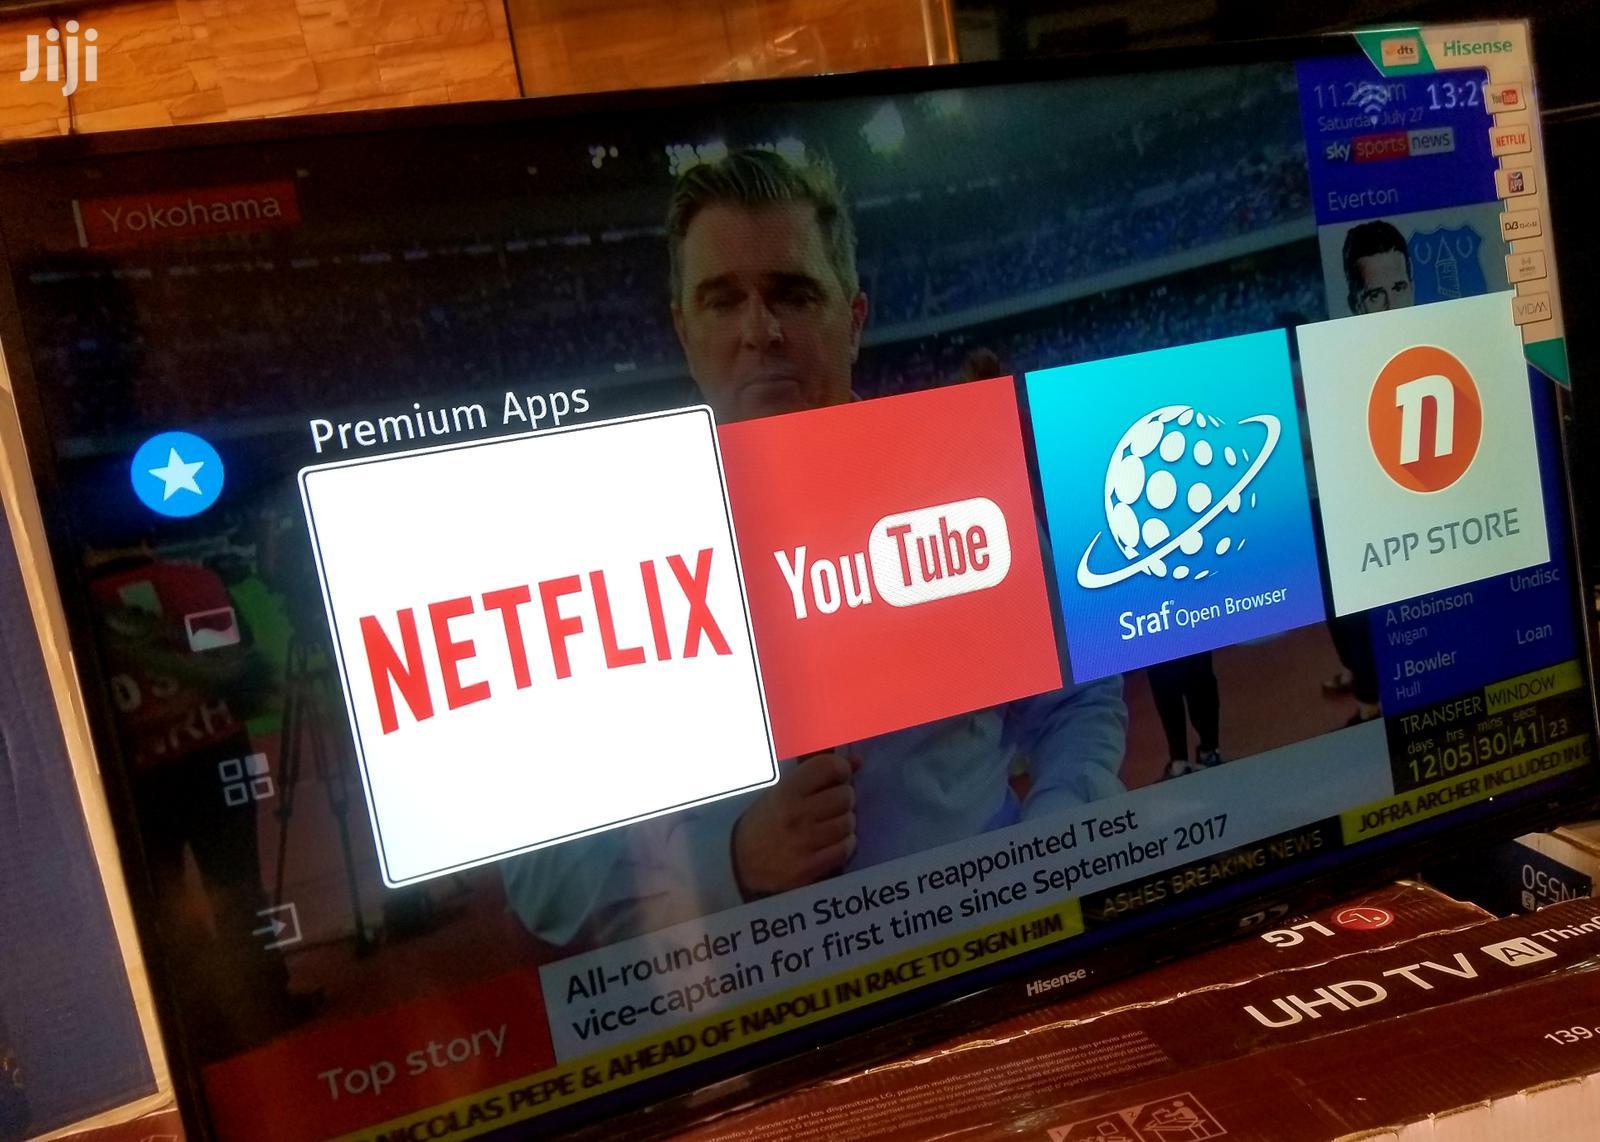 Brand New Hisense Smart TV 55 Inches | TV & DVD Equipment for sale in Kampala, Central Region, Uganda